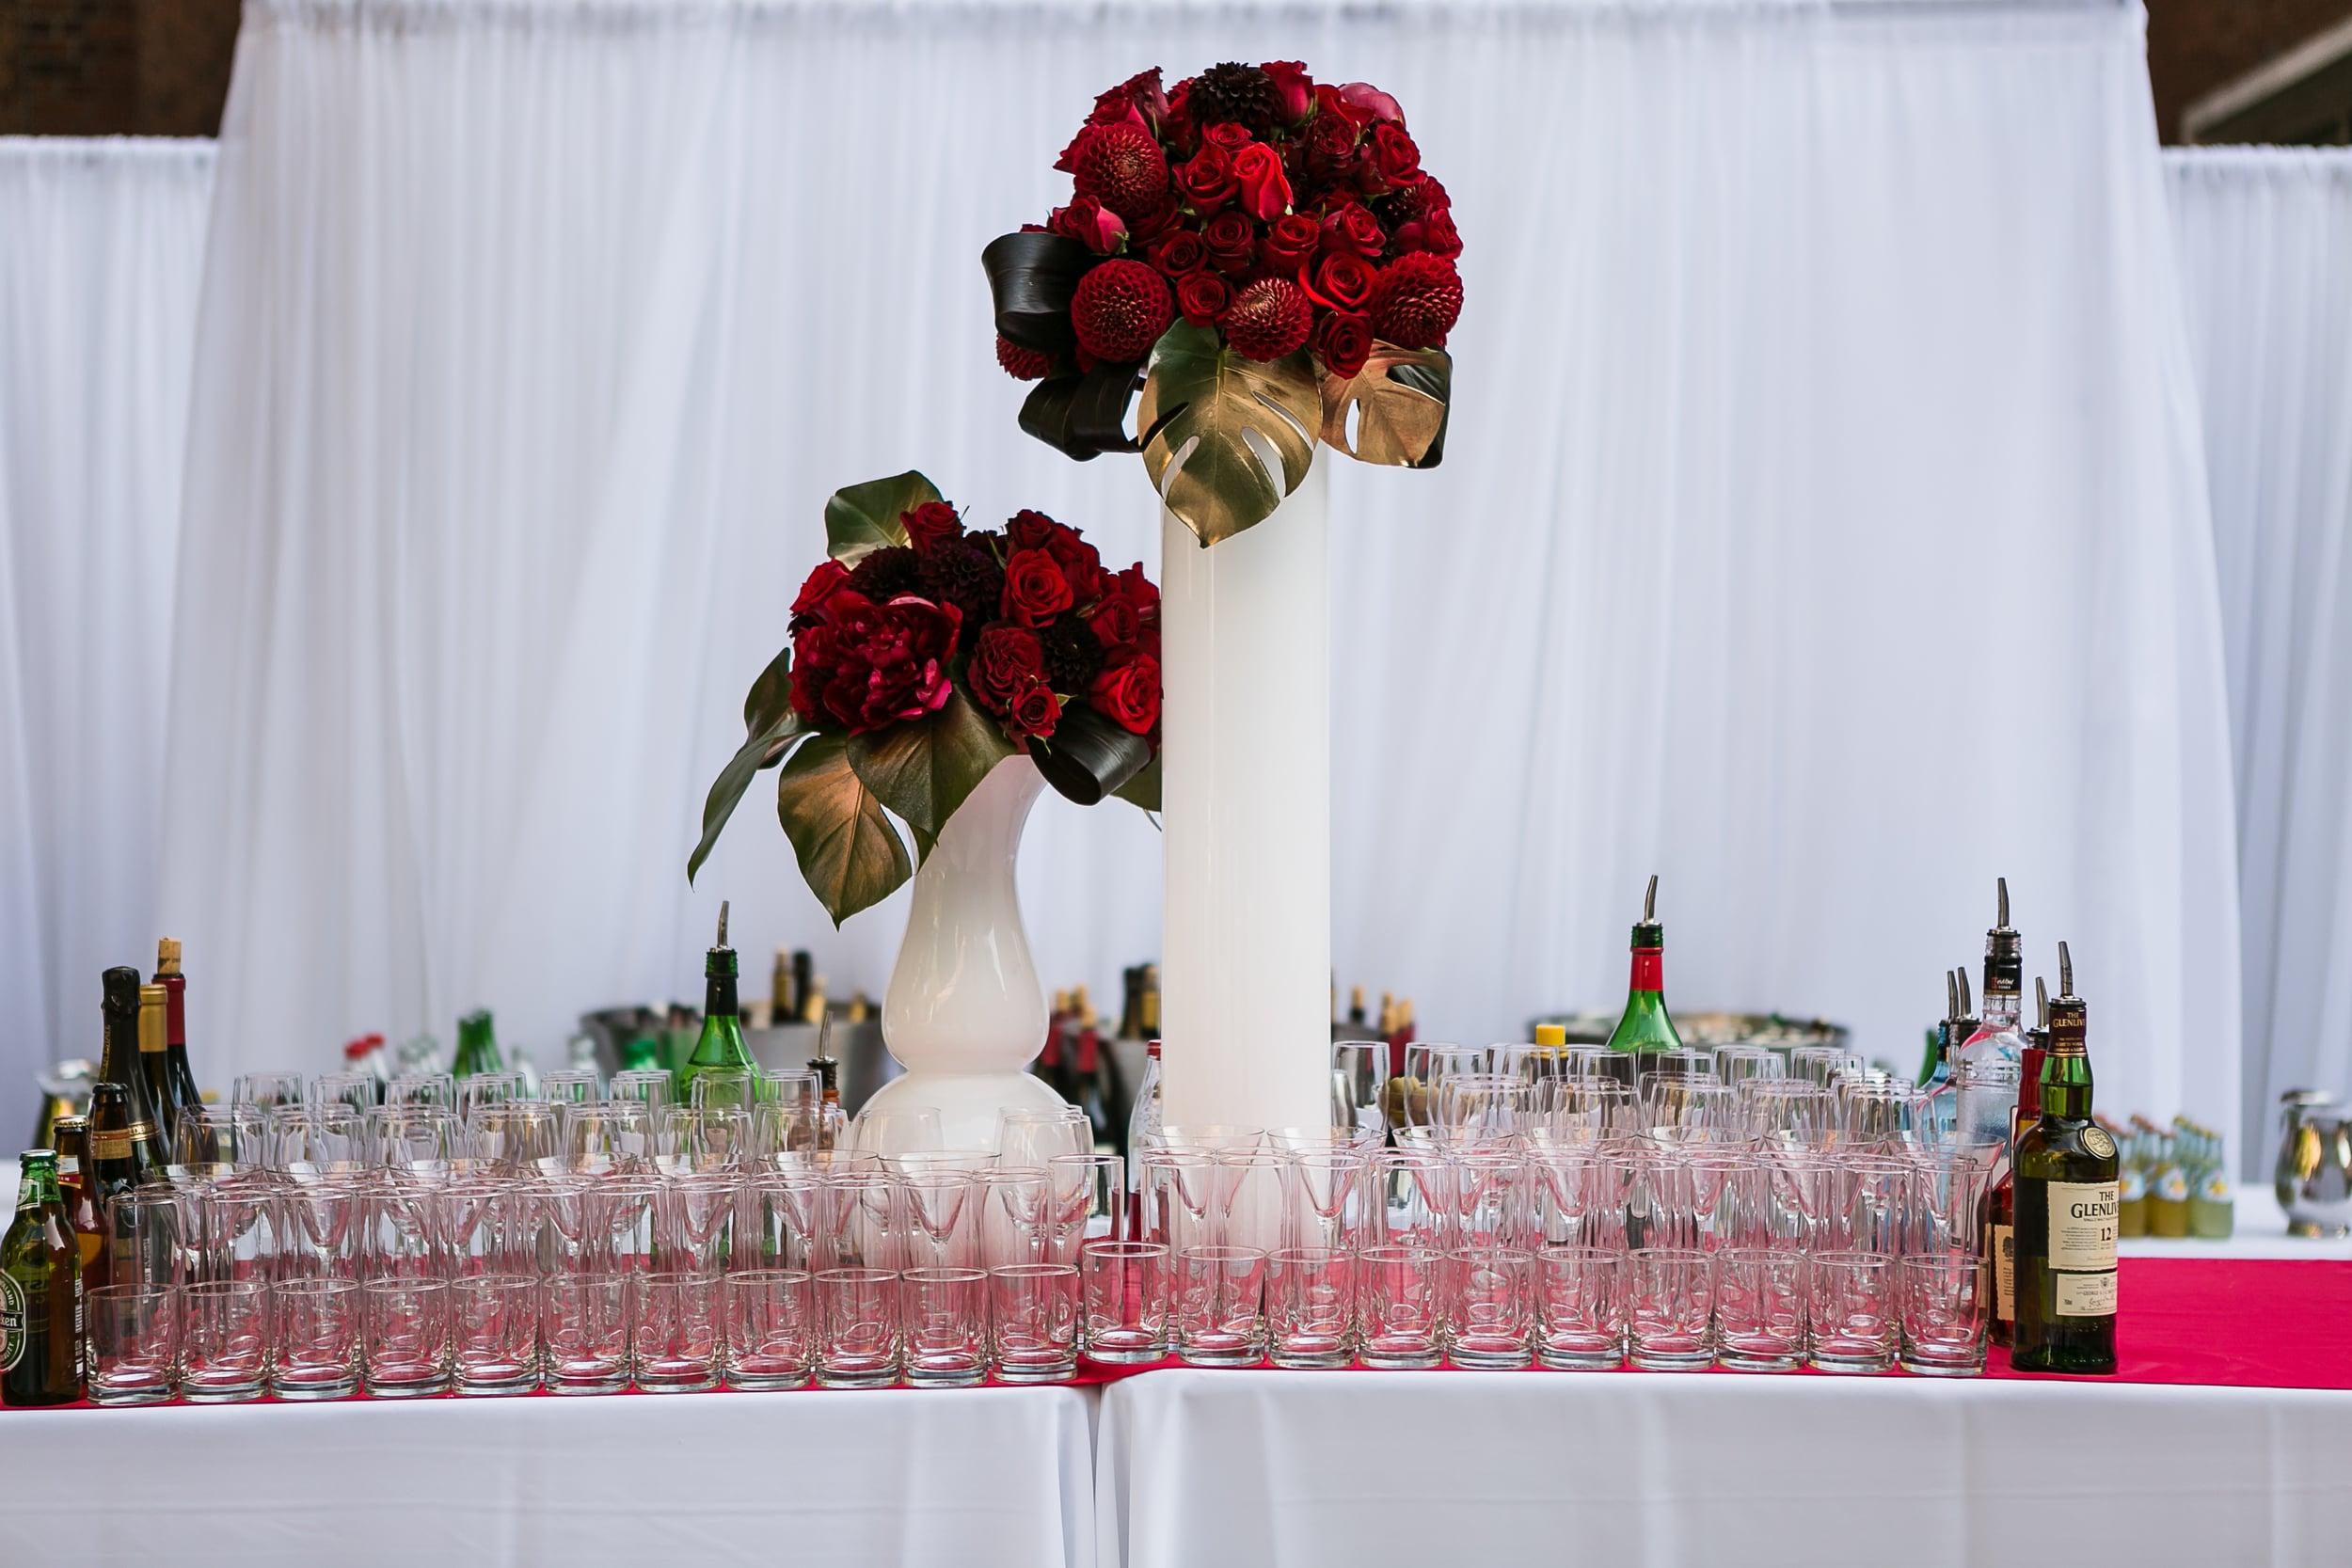 Wedding Pictures (Nora)-67.jpg